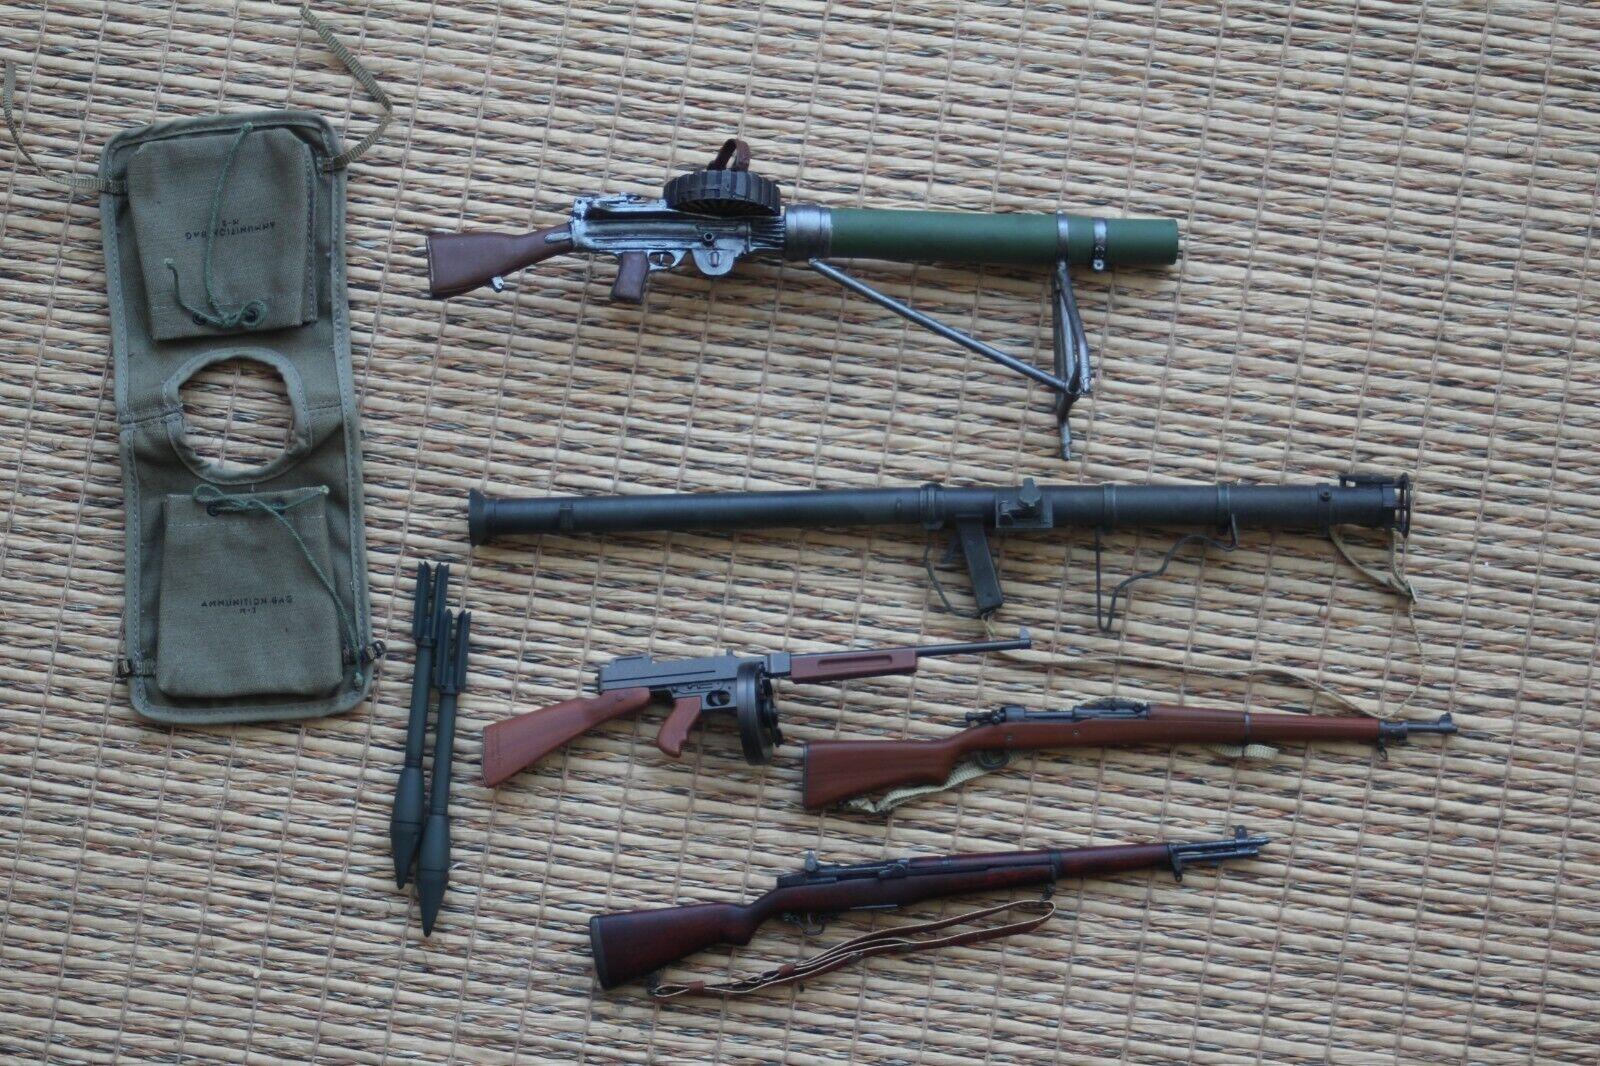 1 6 Lote armas USA WWII bazoka, subfusil thompson rifle garand sprinfield